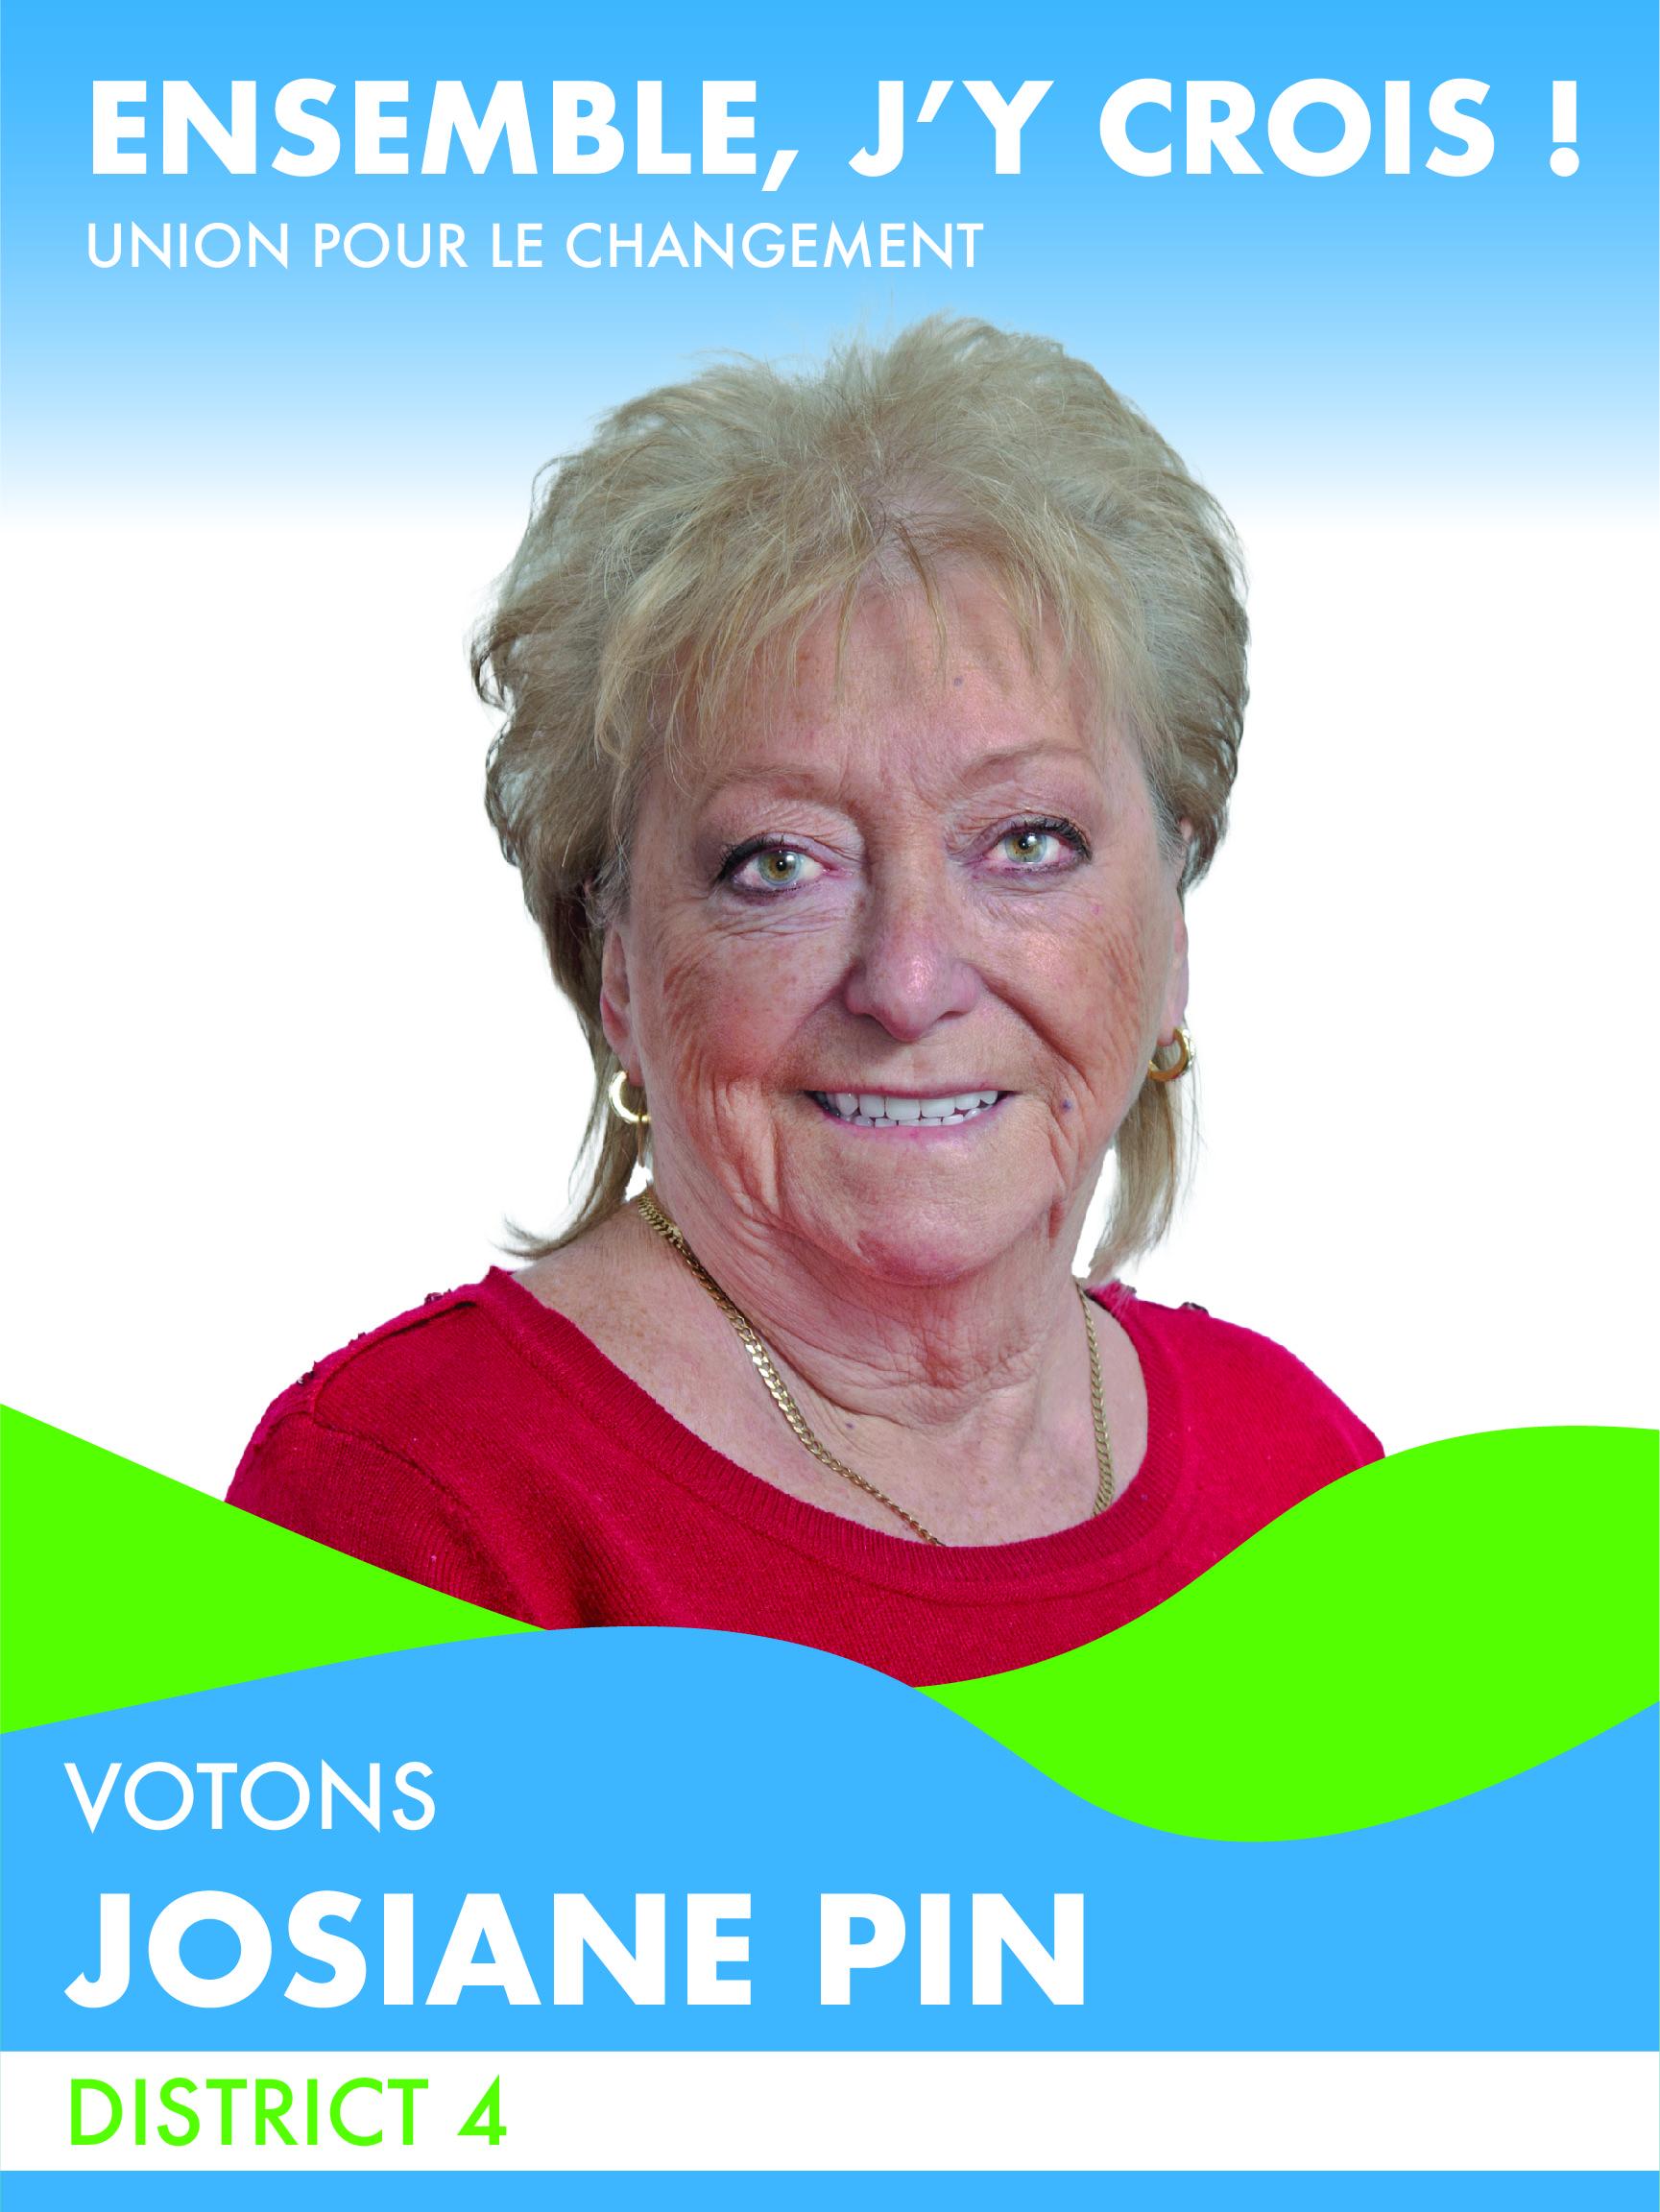 Josiane Pin